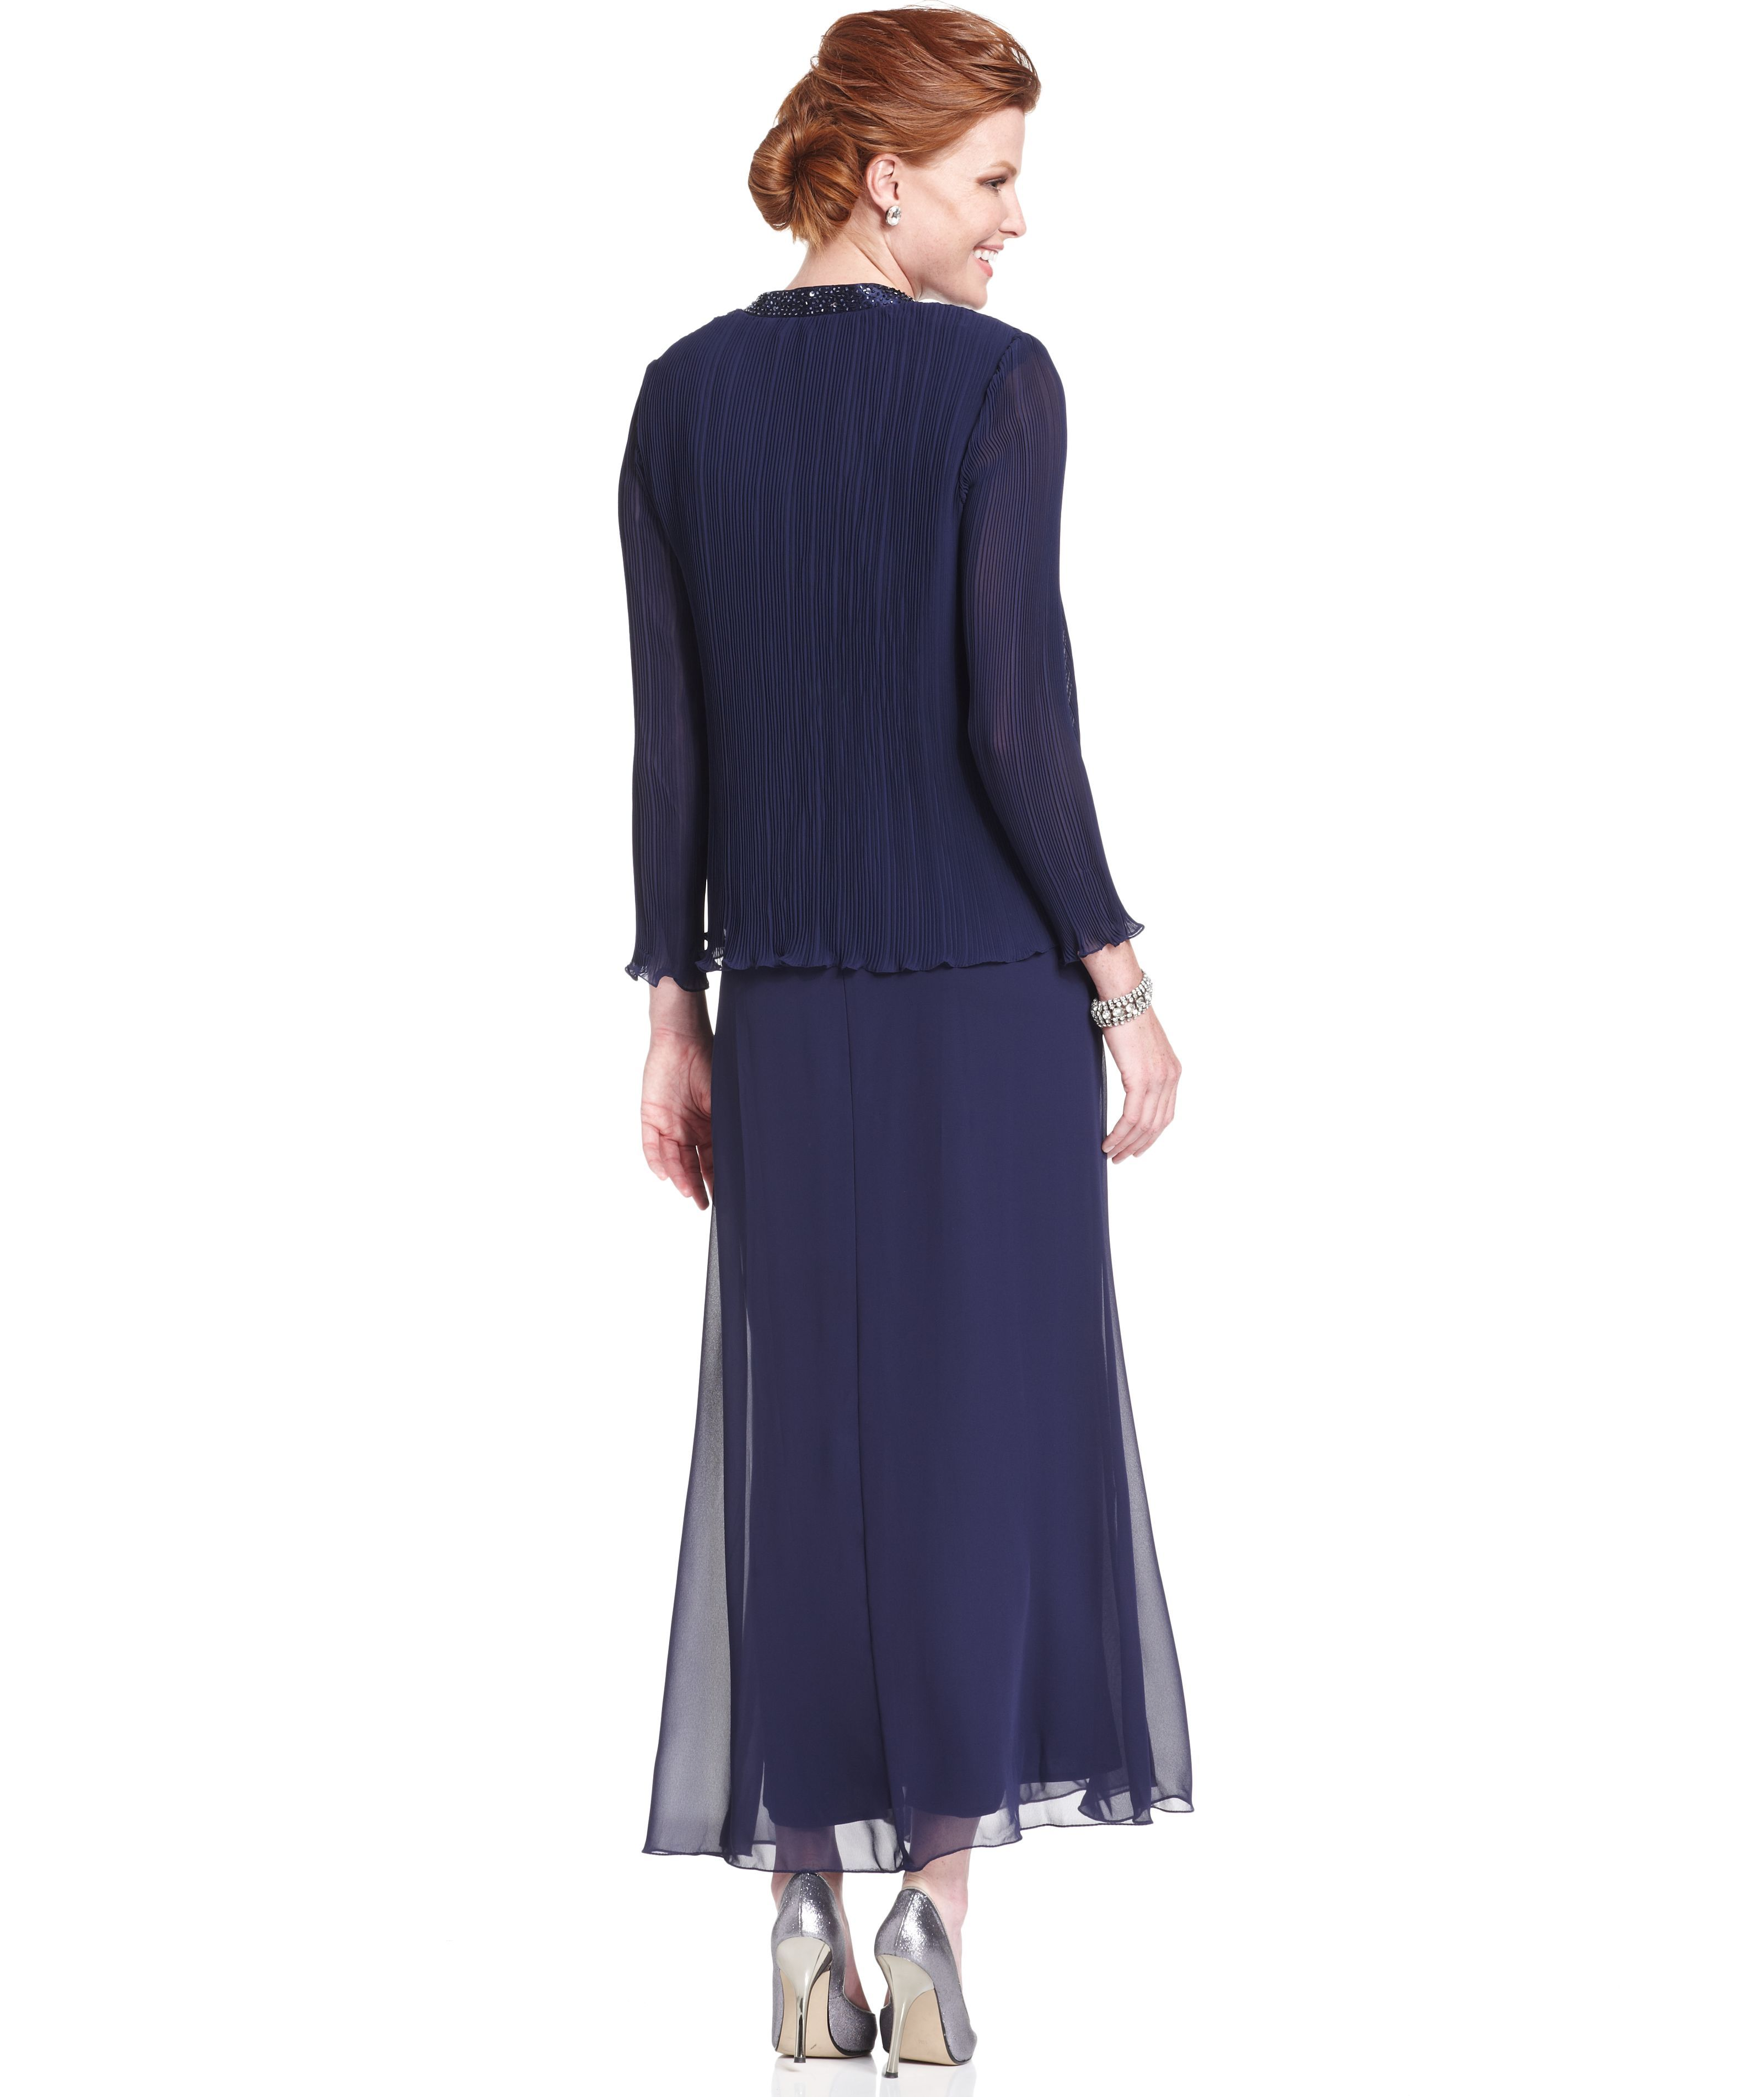 b4a3ea07093 Macys R M Richards Sleeveless Beaded V-Neck Dress and Jacket ---- Jennifer  McDonough